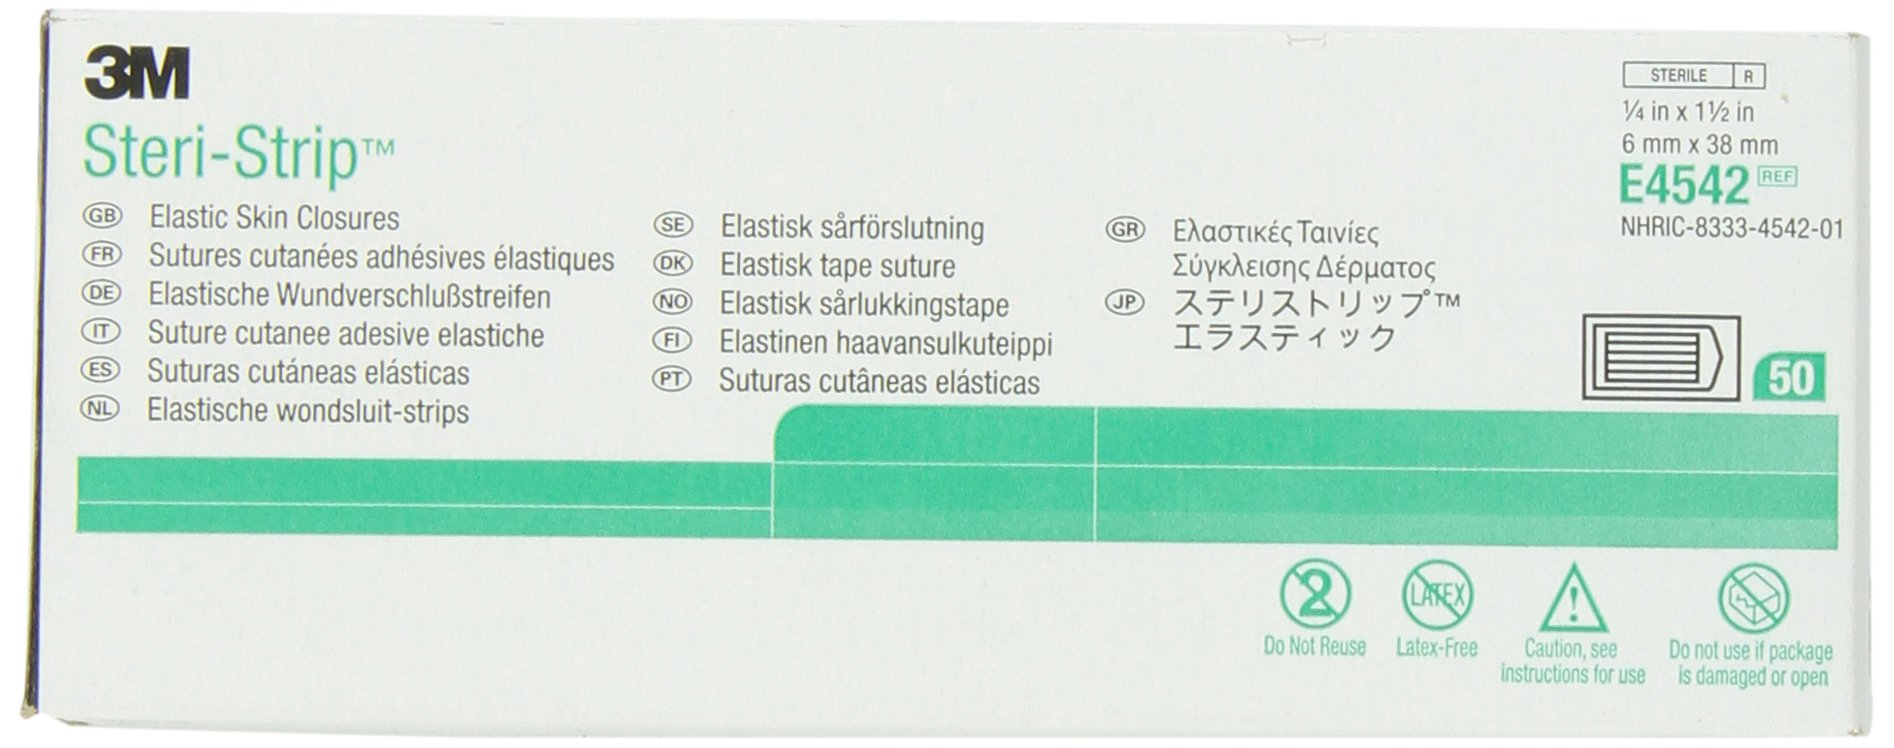 3M Steri-Strip Elastic Skin Closures E4542, 50 Strips